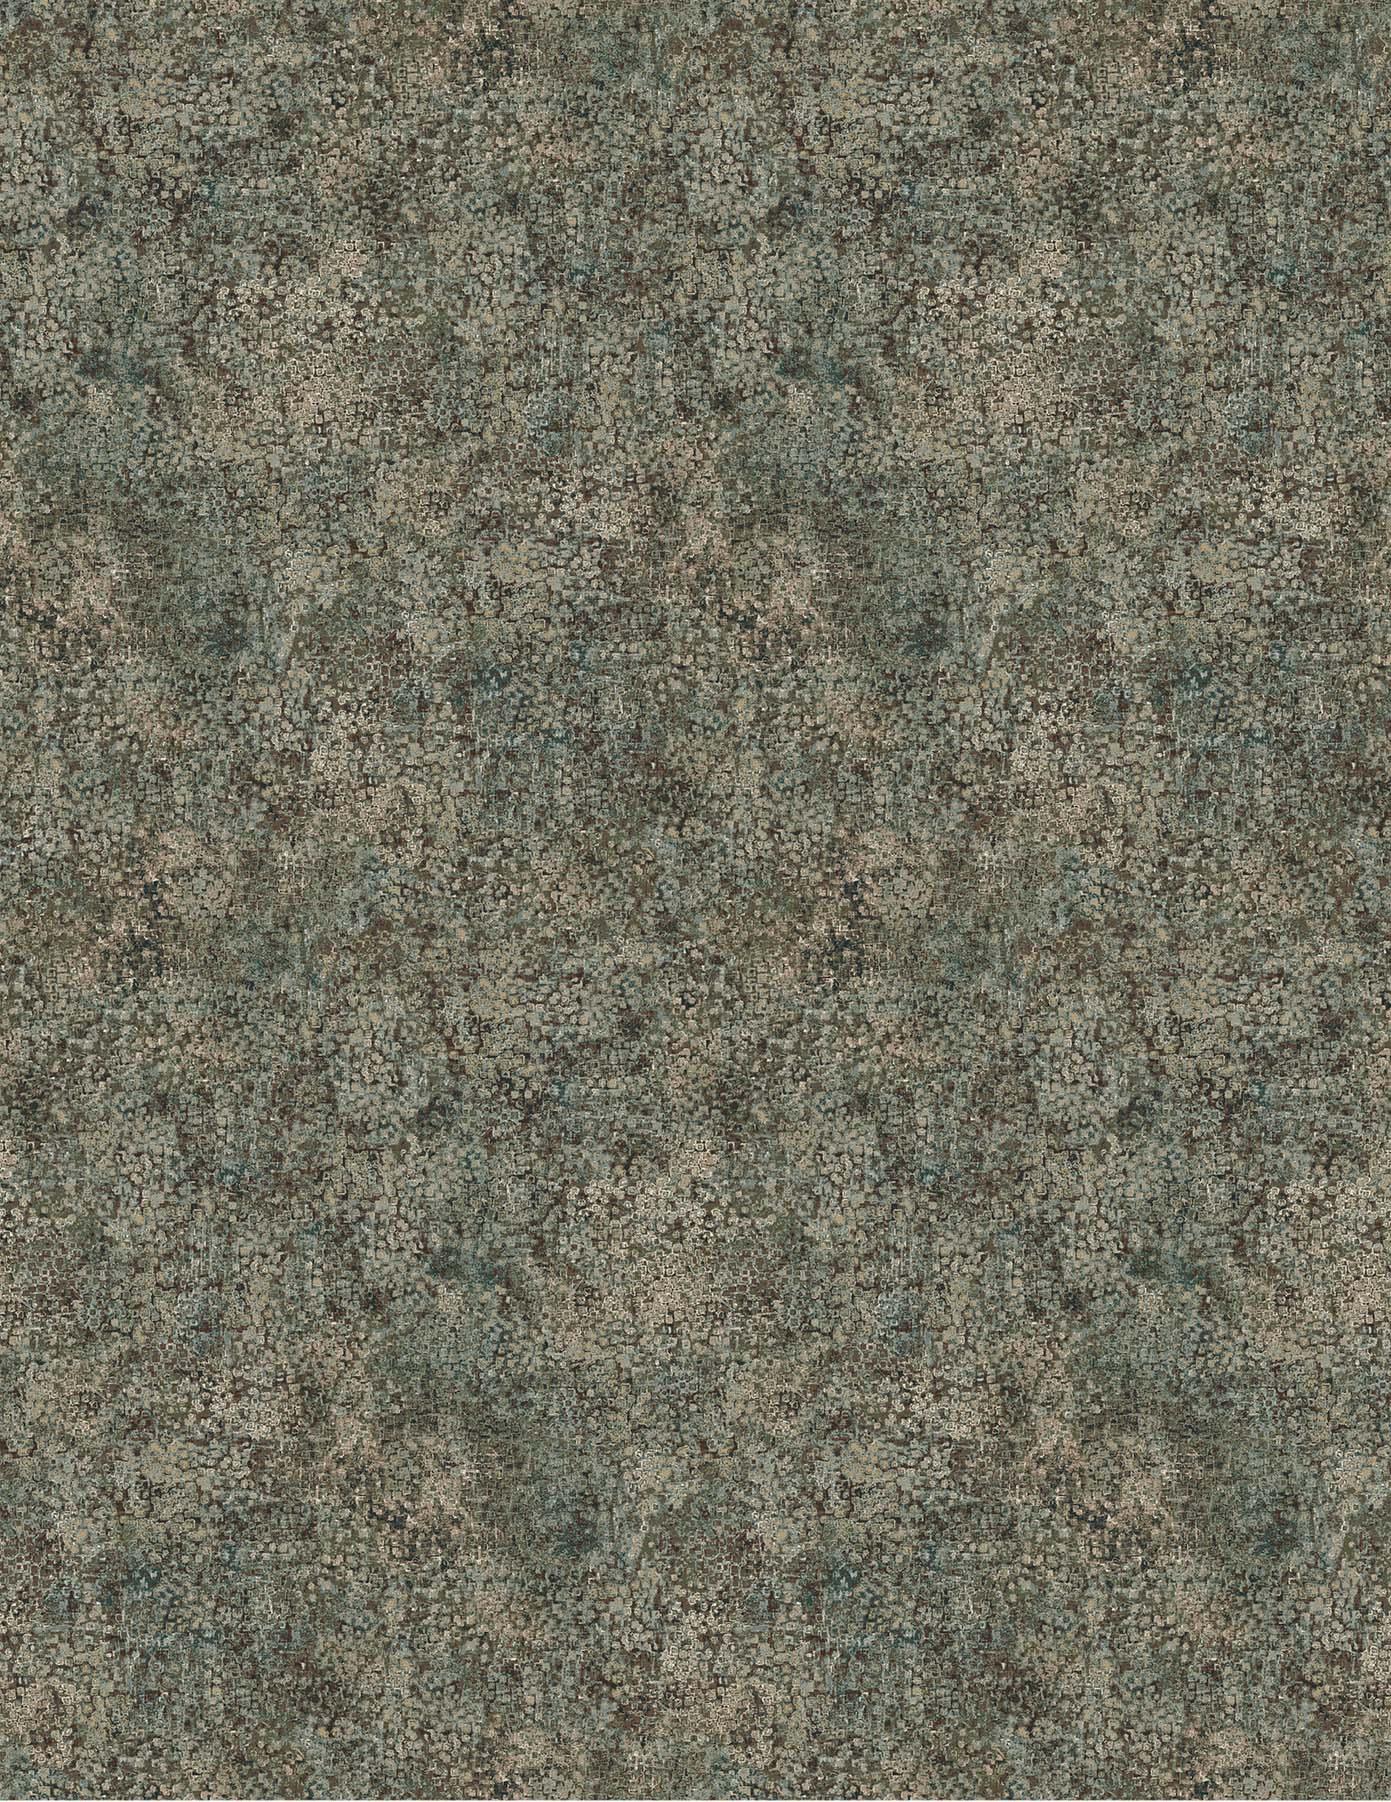 Ophelia by Penelope Duchesne - Calcite Texture - Dark Gray Green